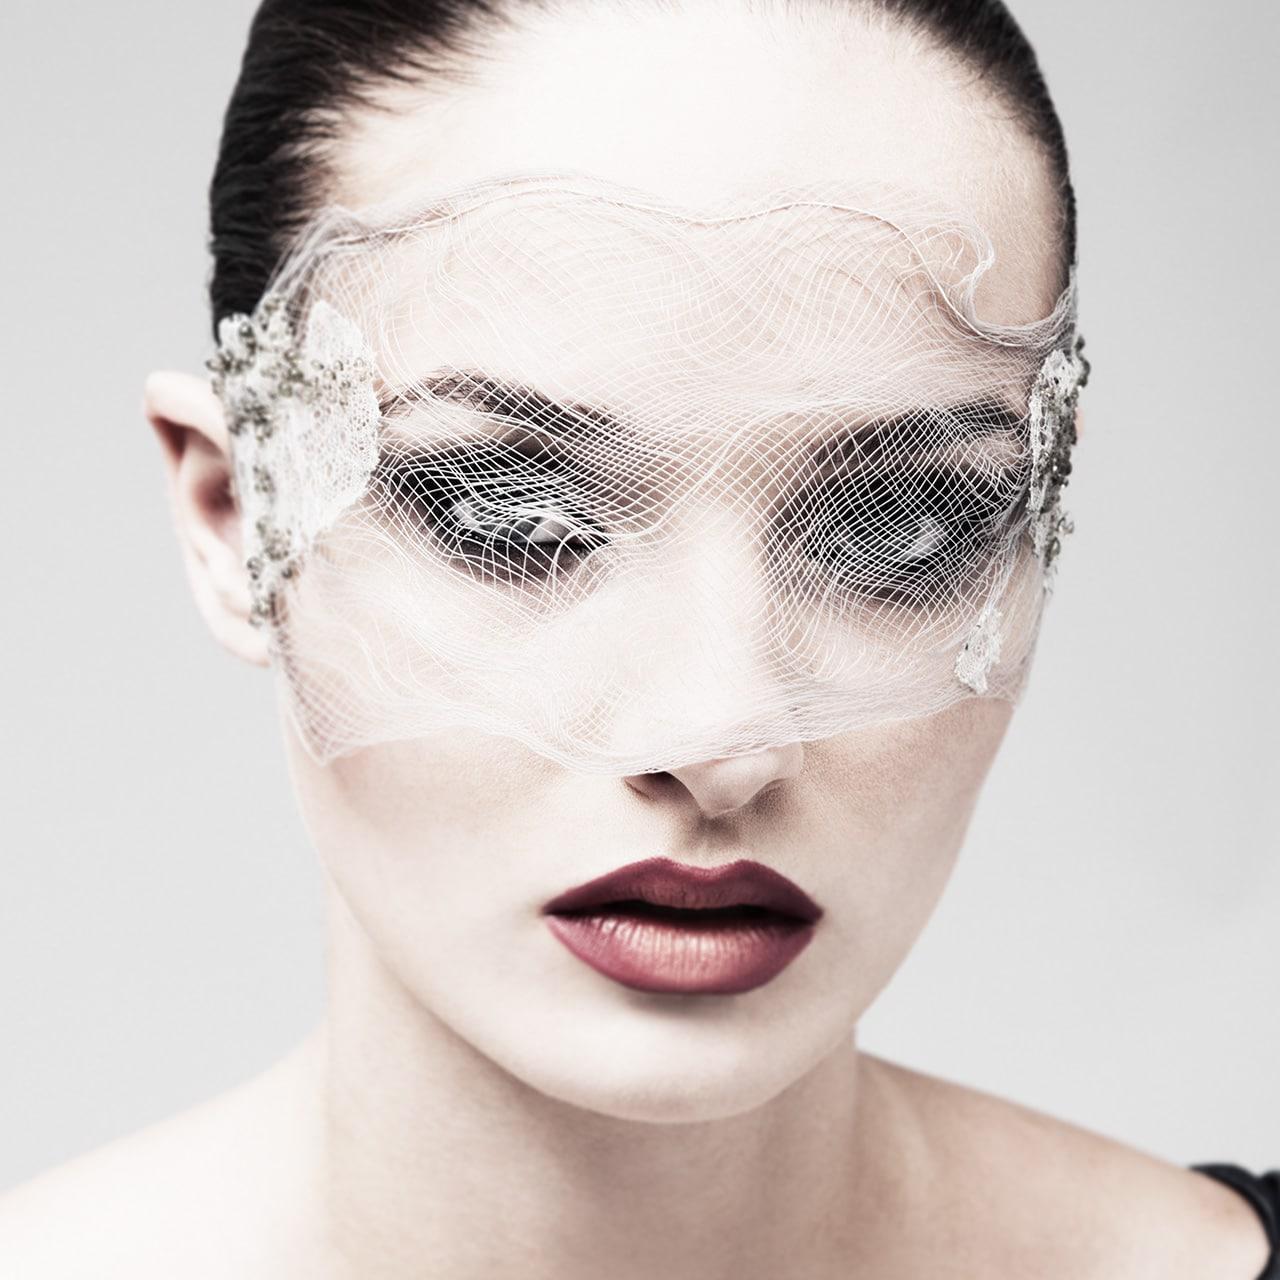 Monvieve Manon Headpiece Collection